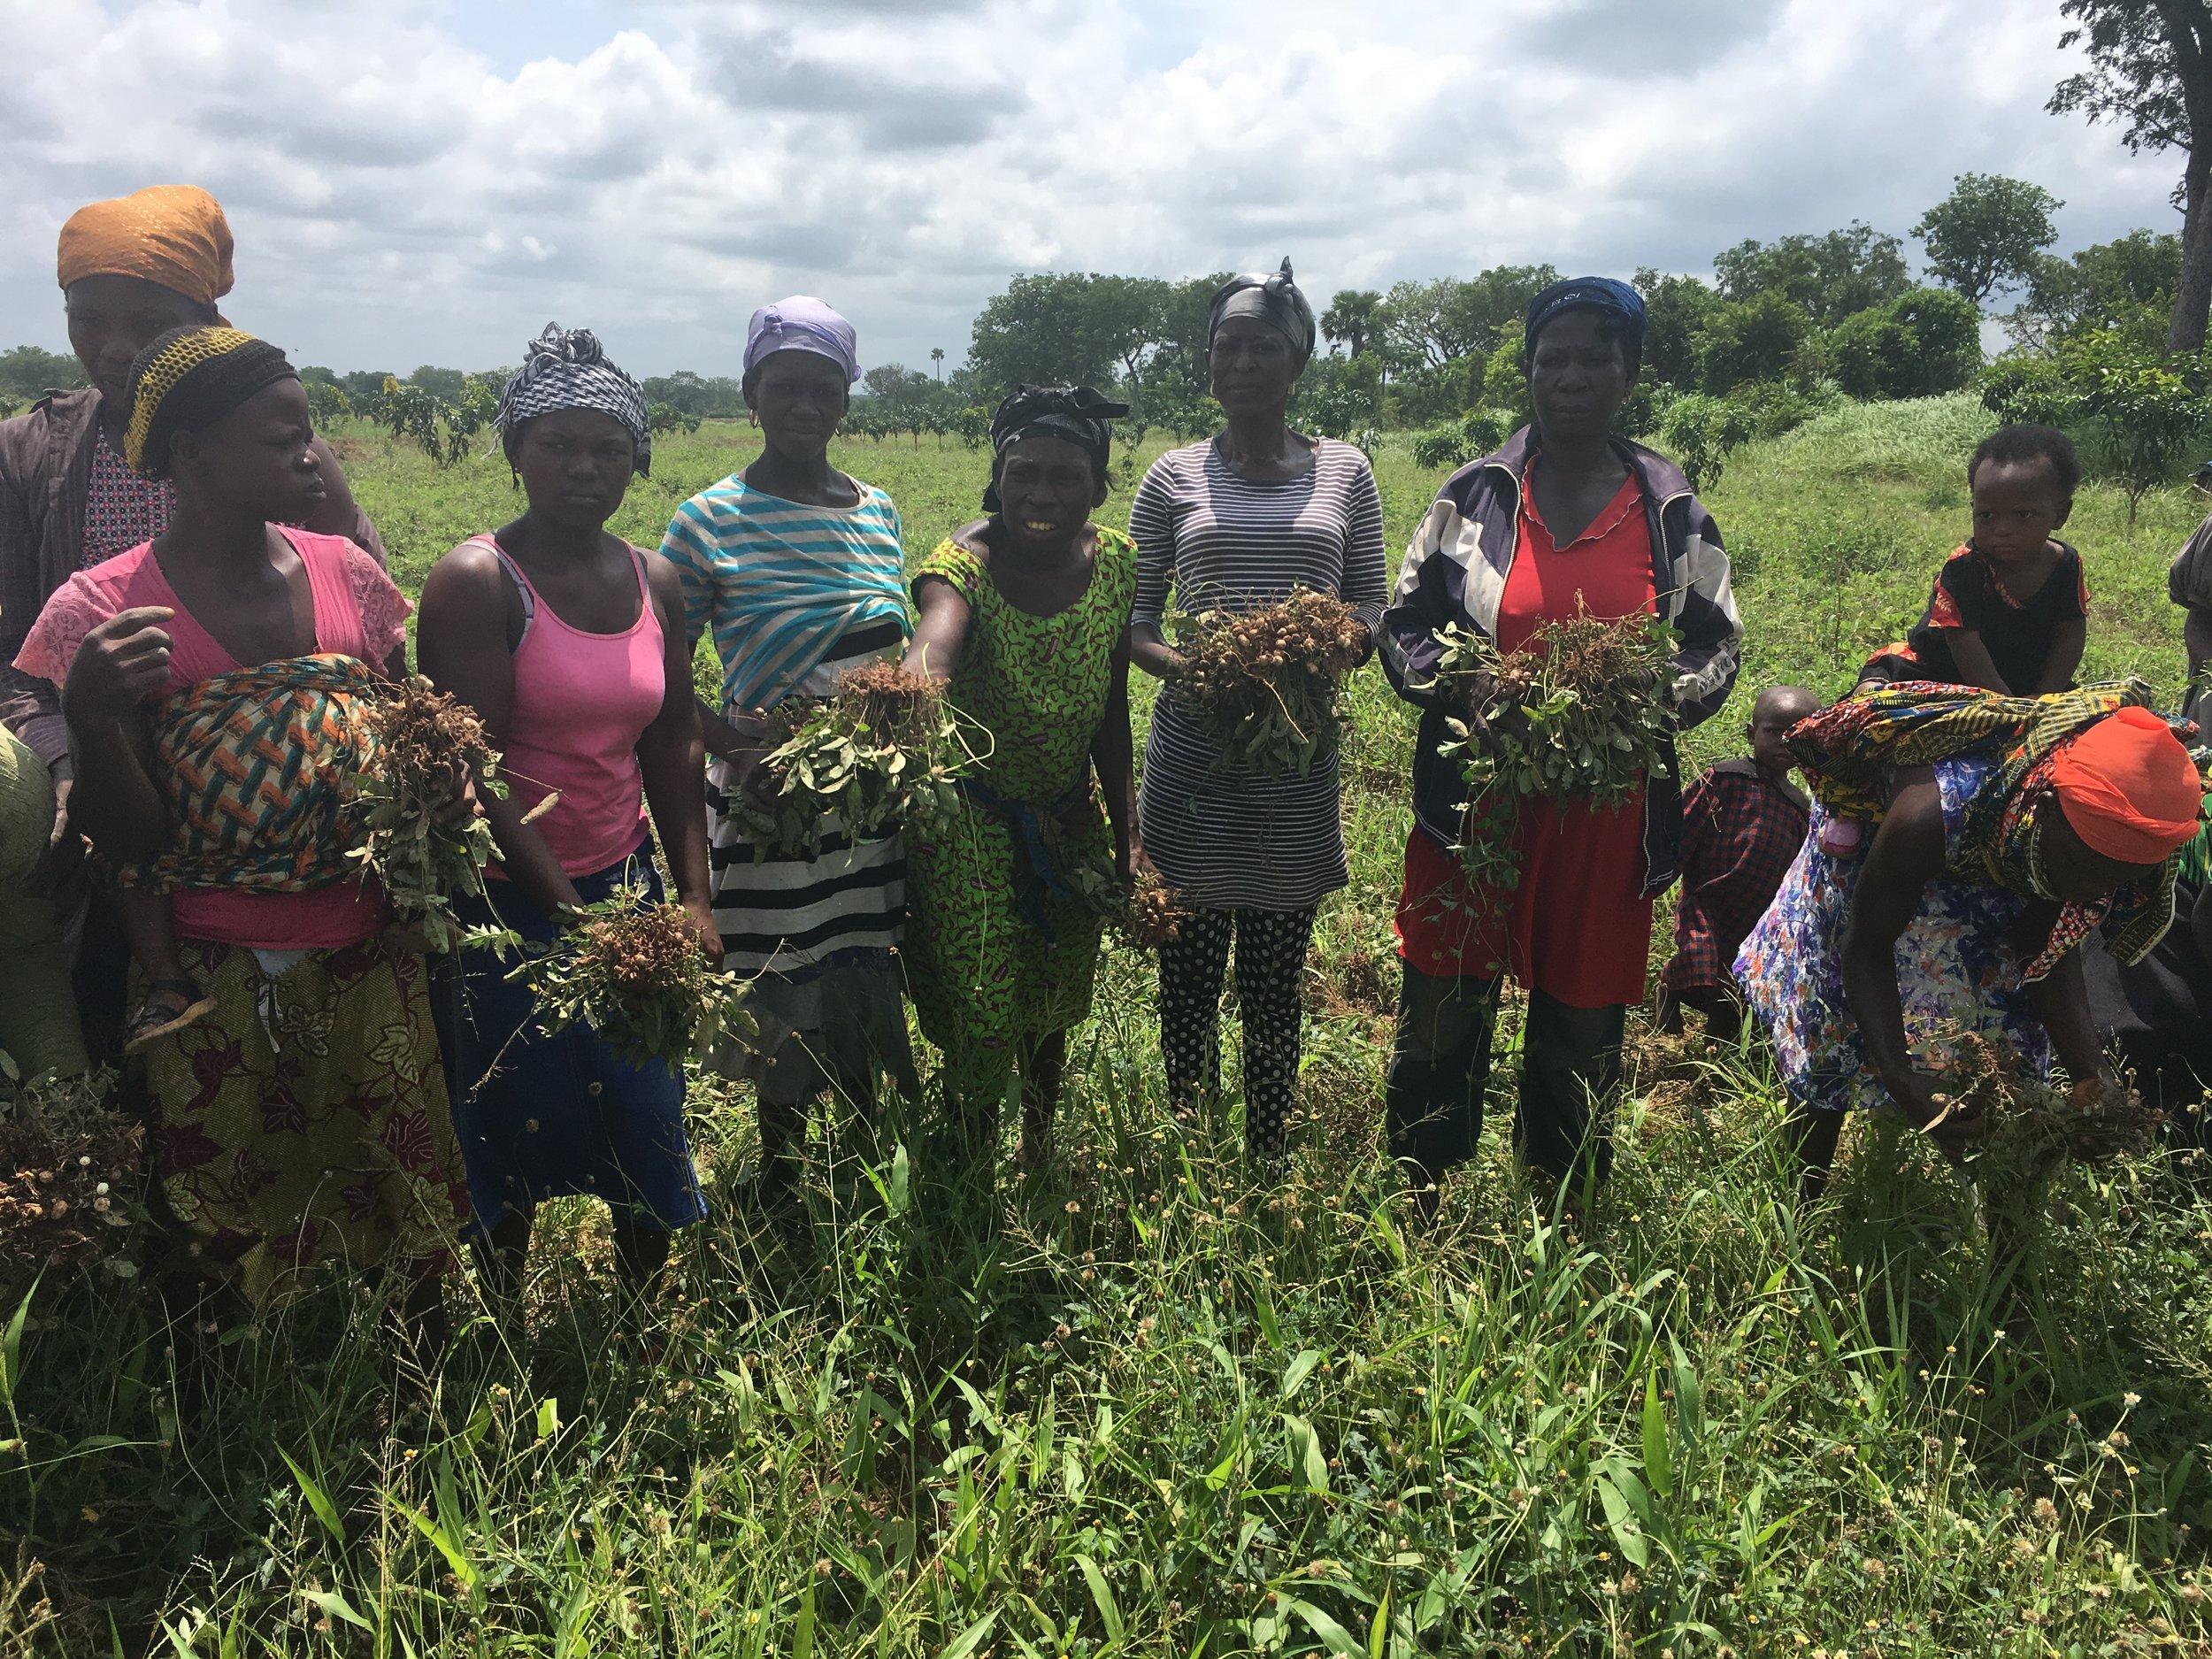 women farmers in aframplains 2.JPG